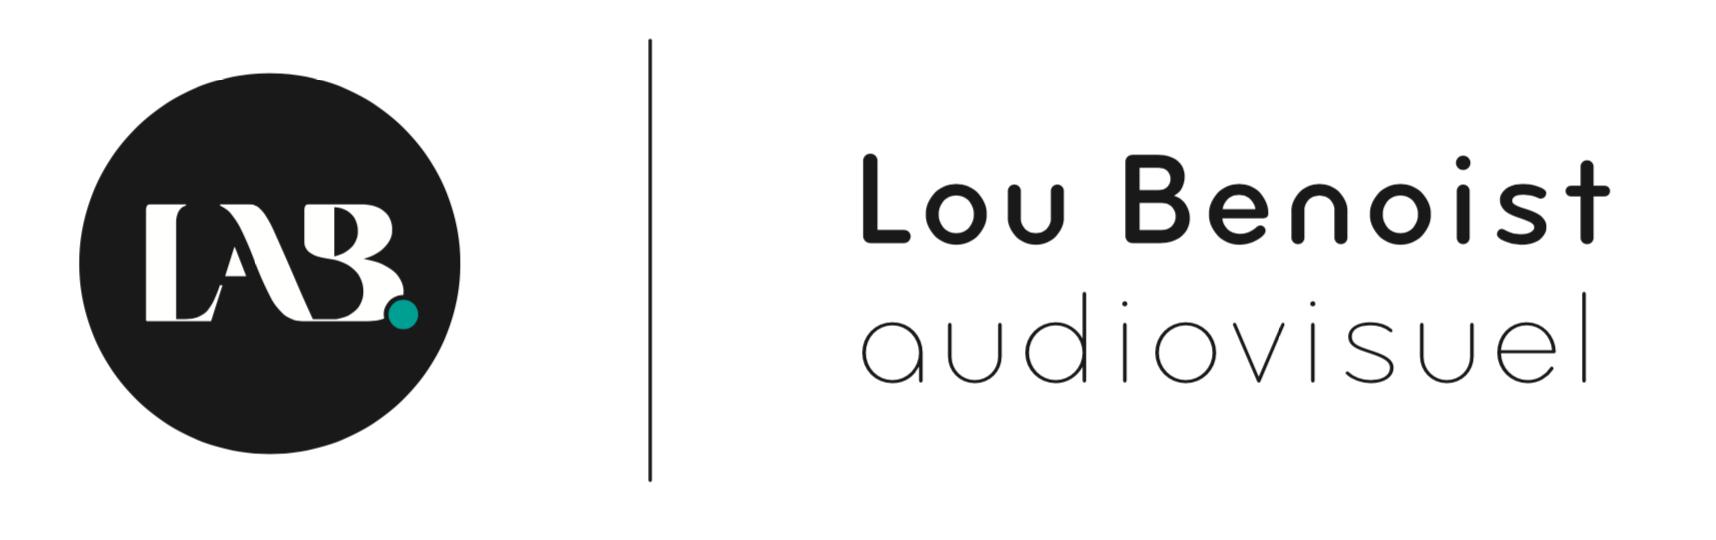 Lou Benoist Audiovisuel